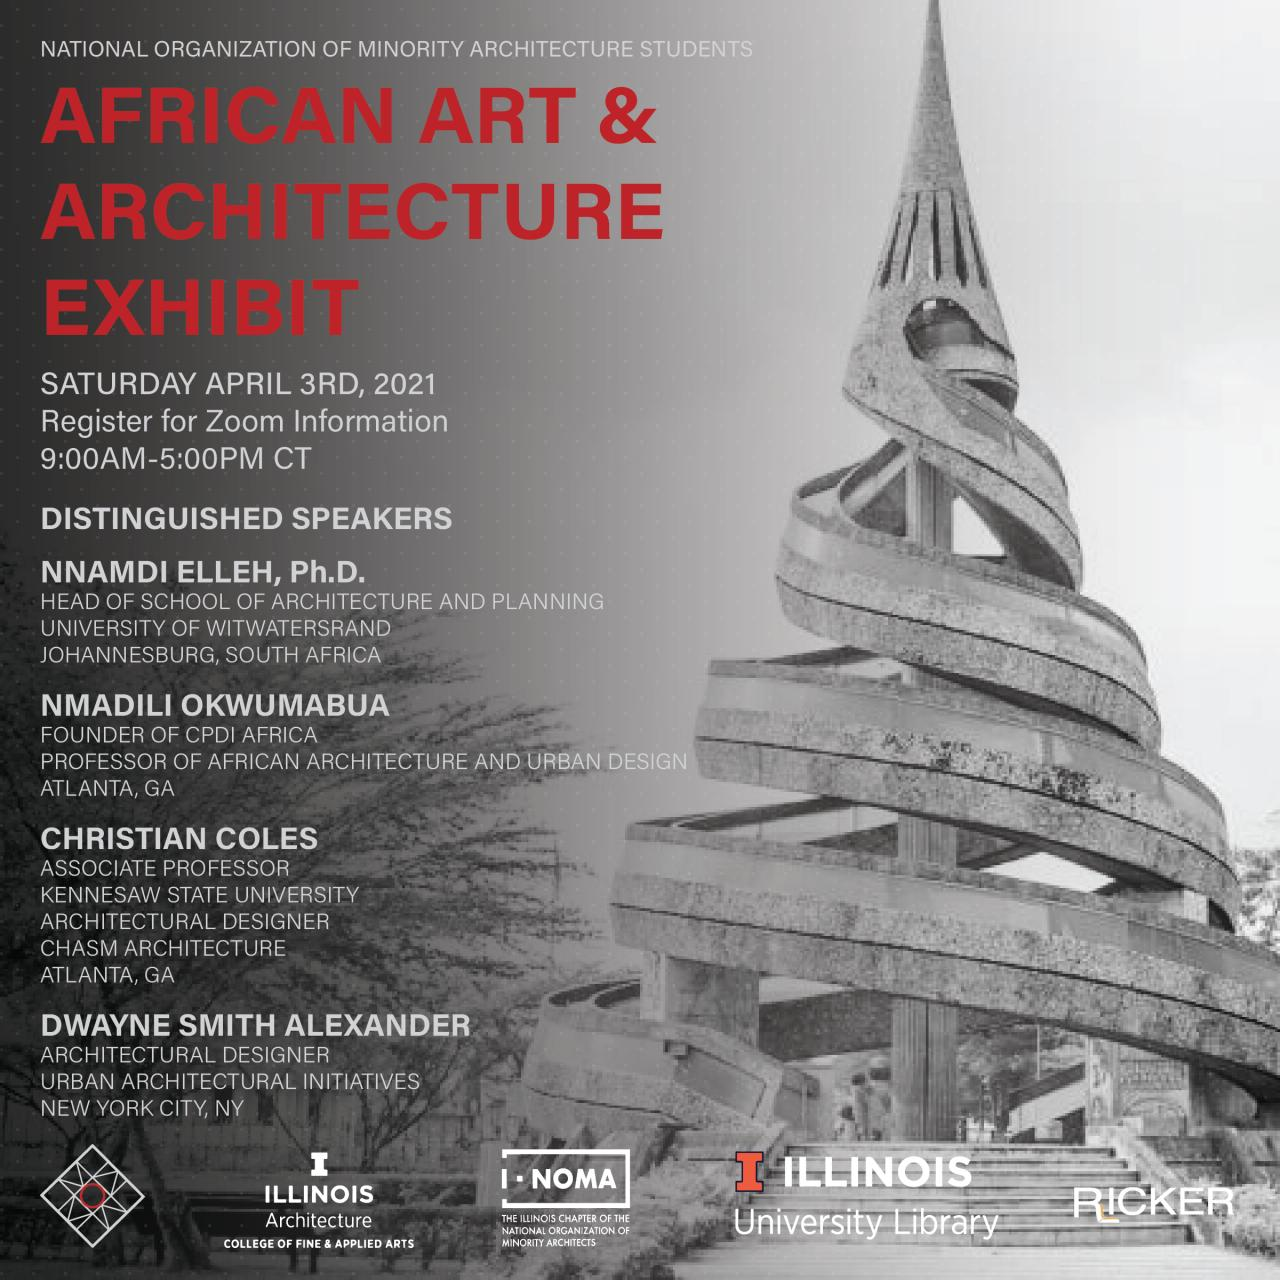 poster announcement for symposium